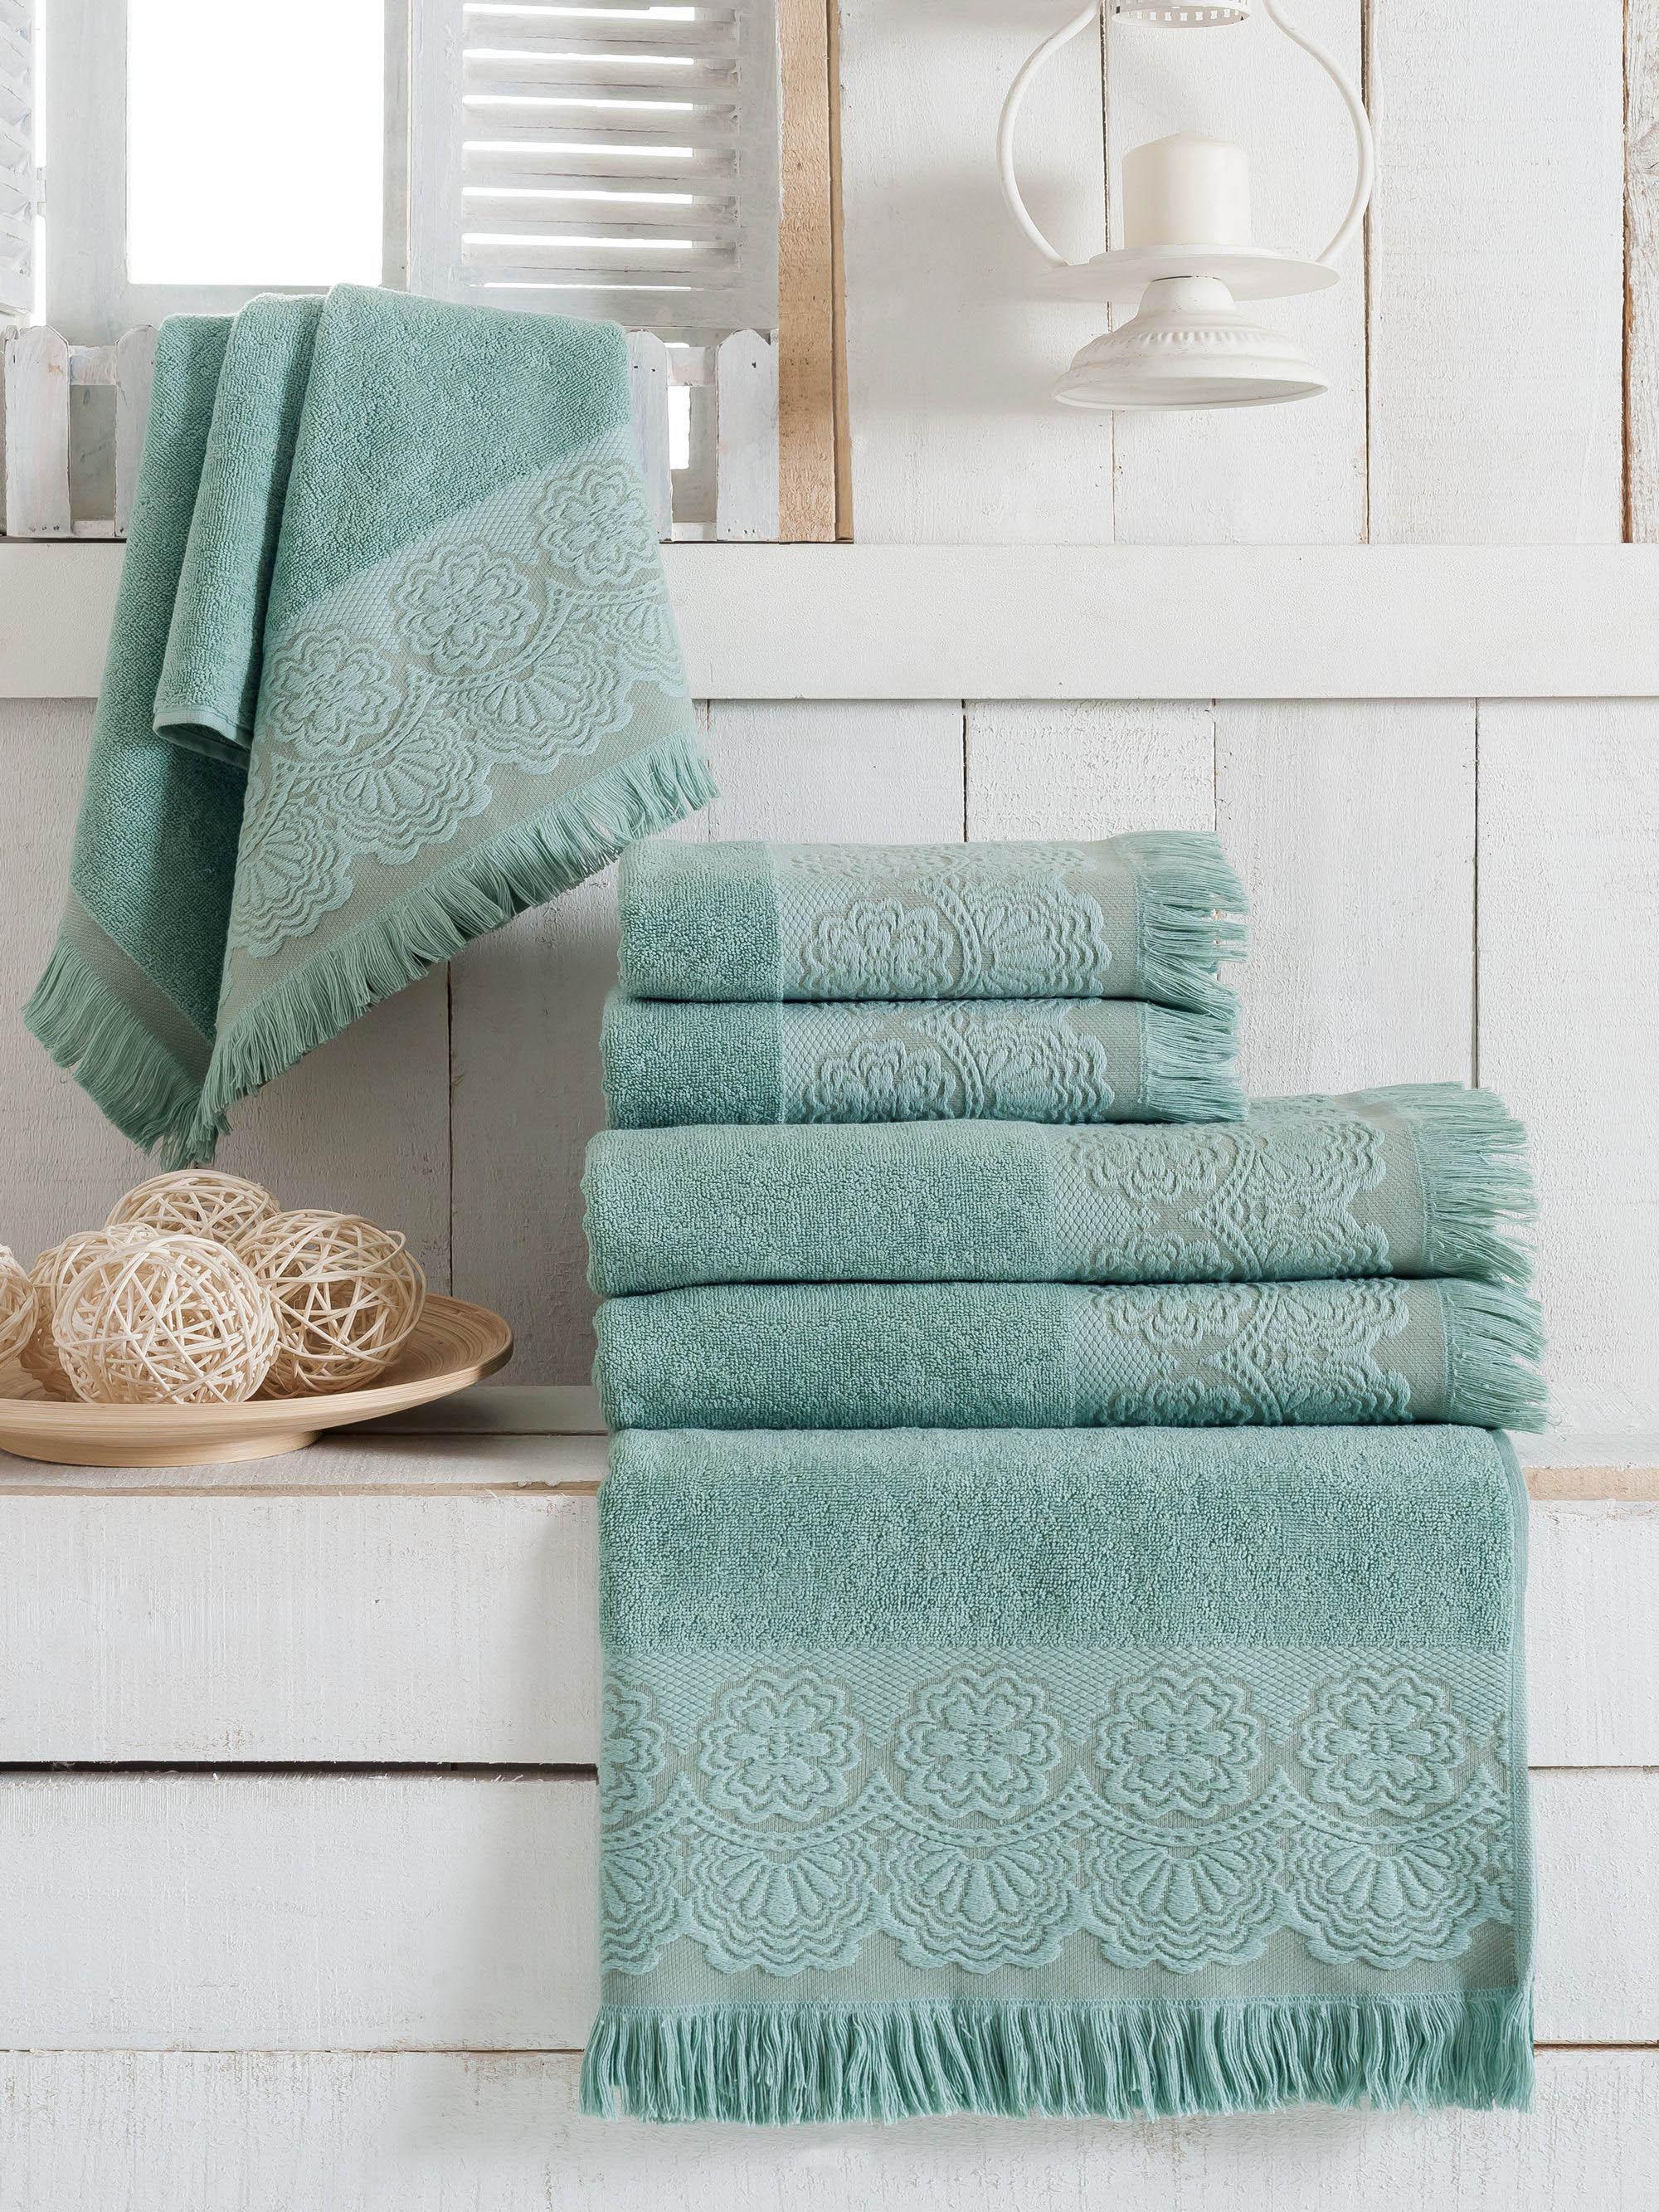 Полотенца Sokuculer Полотенце Zara Цвет: Мятный (70х140 см - 3 шт) полотенца банные spasilk полотенце 3 шт